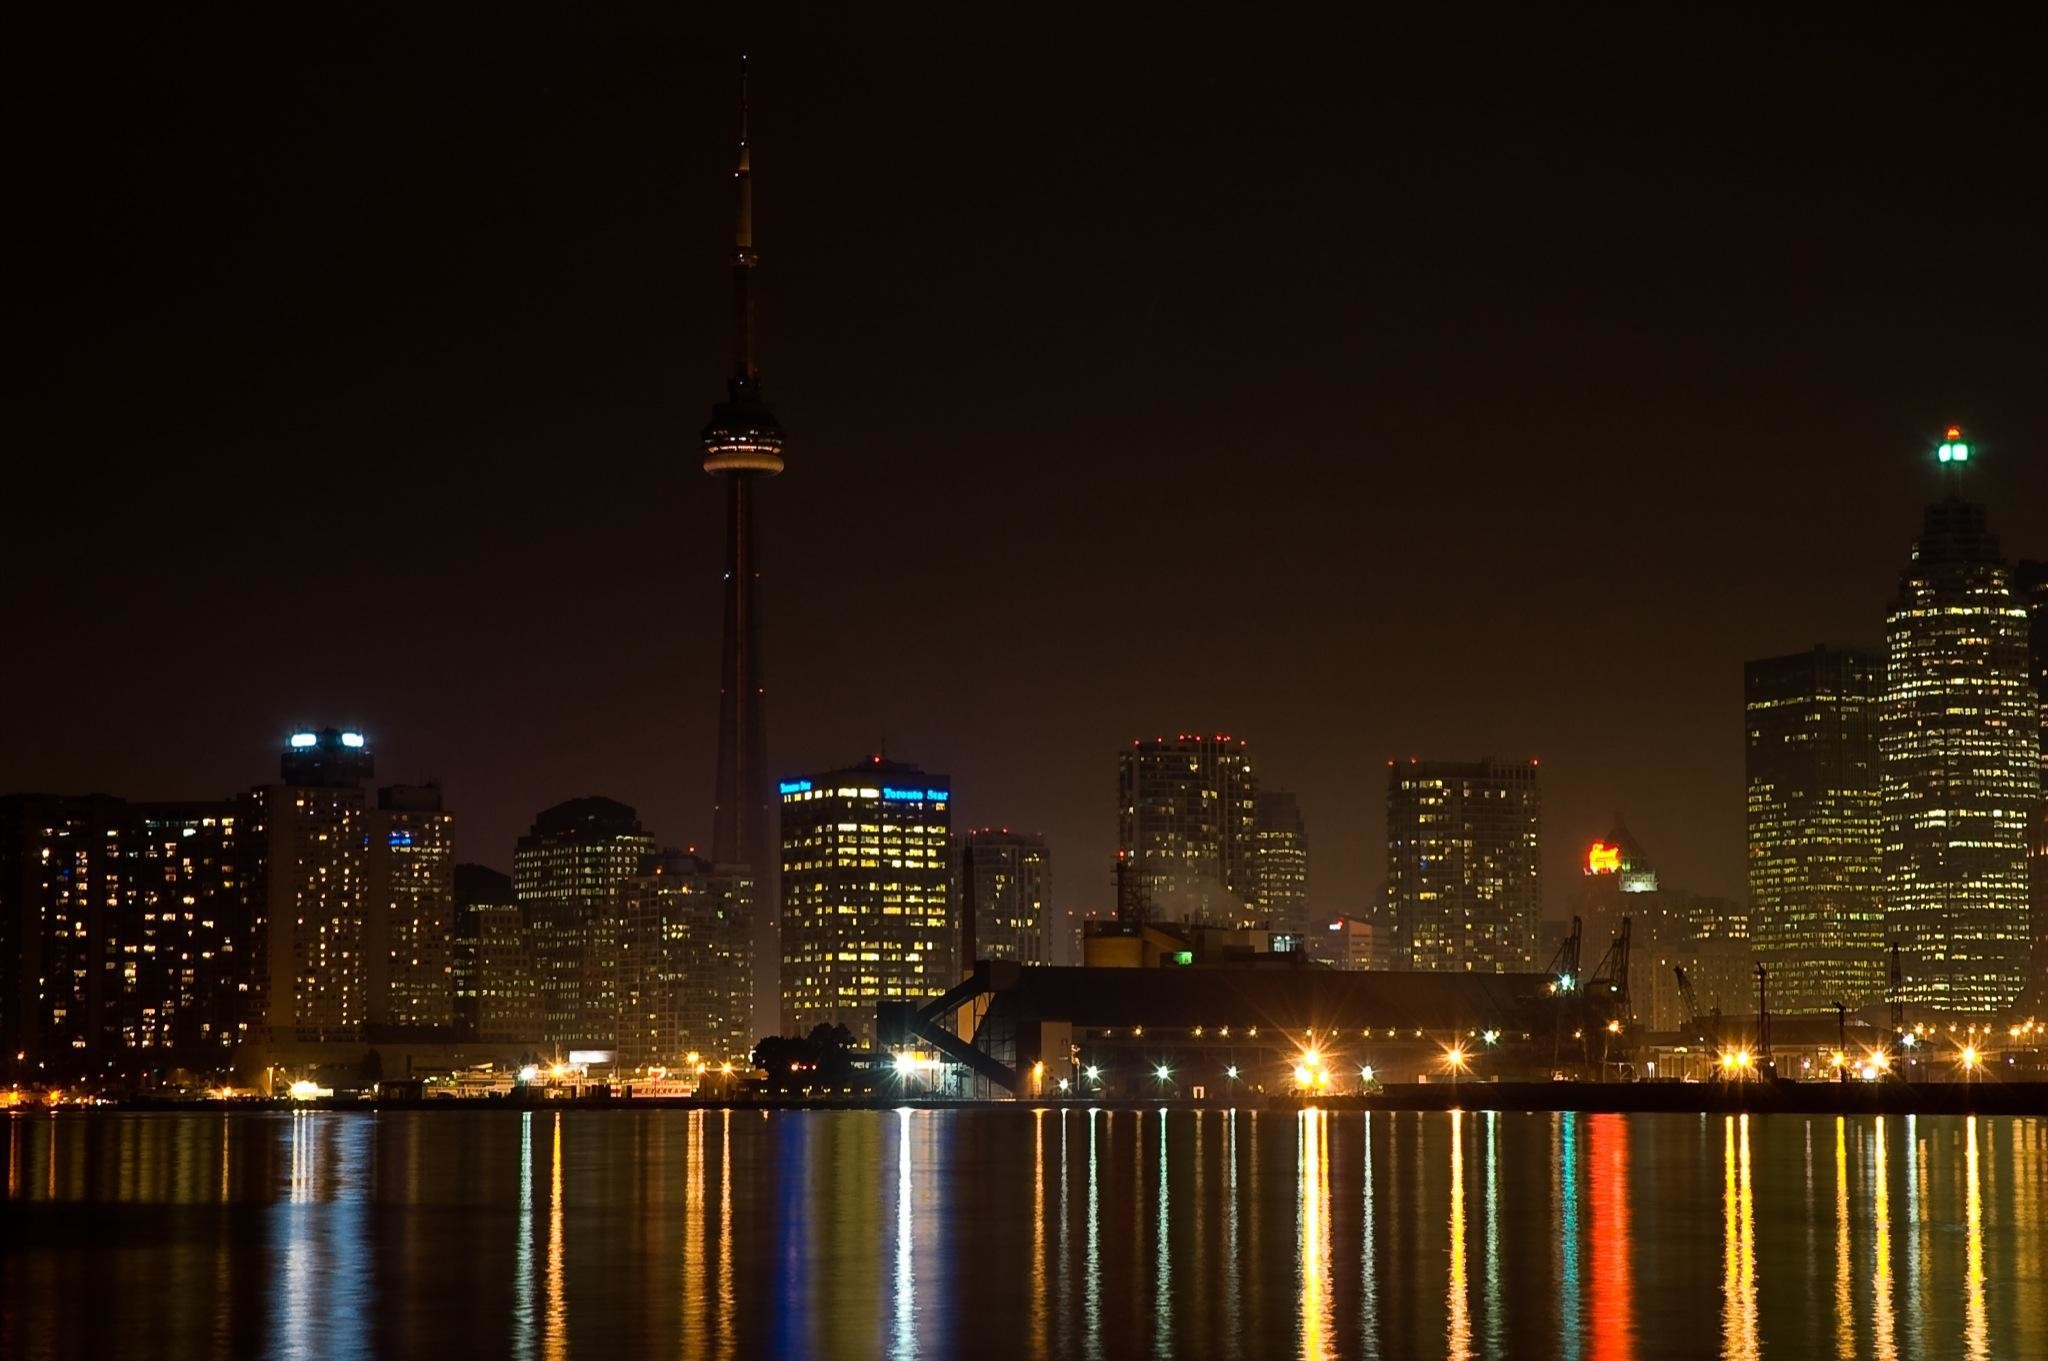 Good Wallpaper Mac Toronto - 1198563-toronto-skyline-wallpaper-2048x1361-for-mac  Collection_543897.jpg